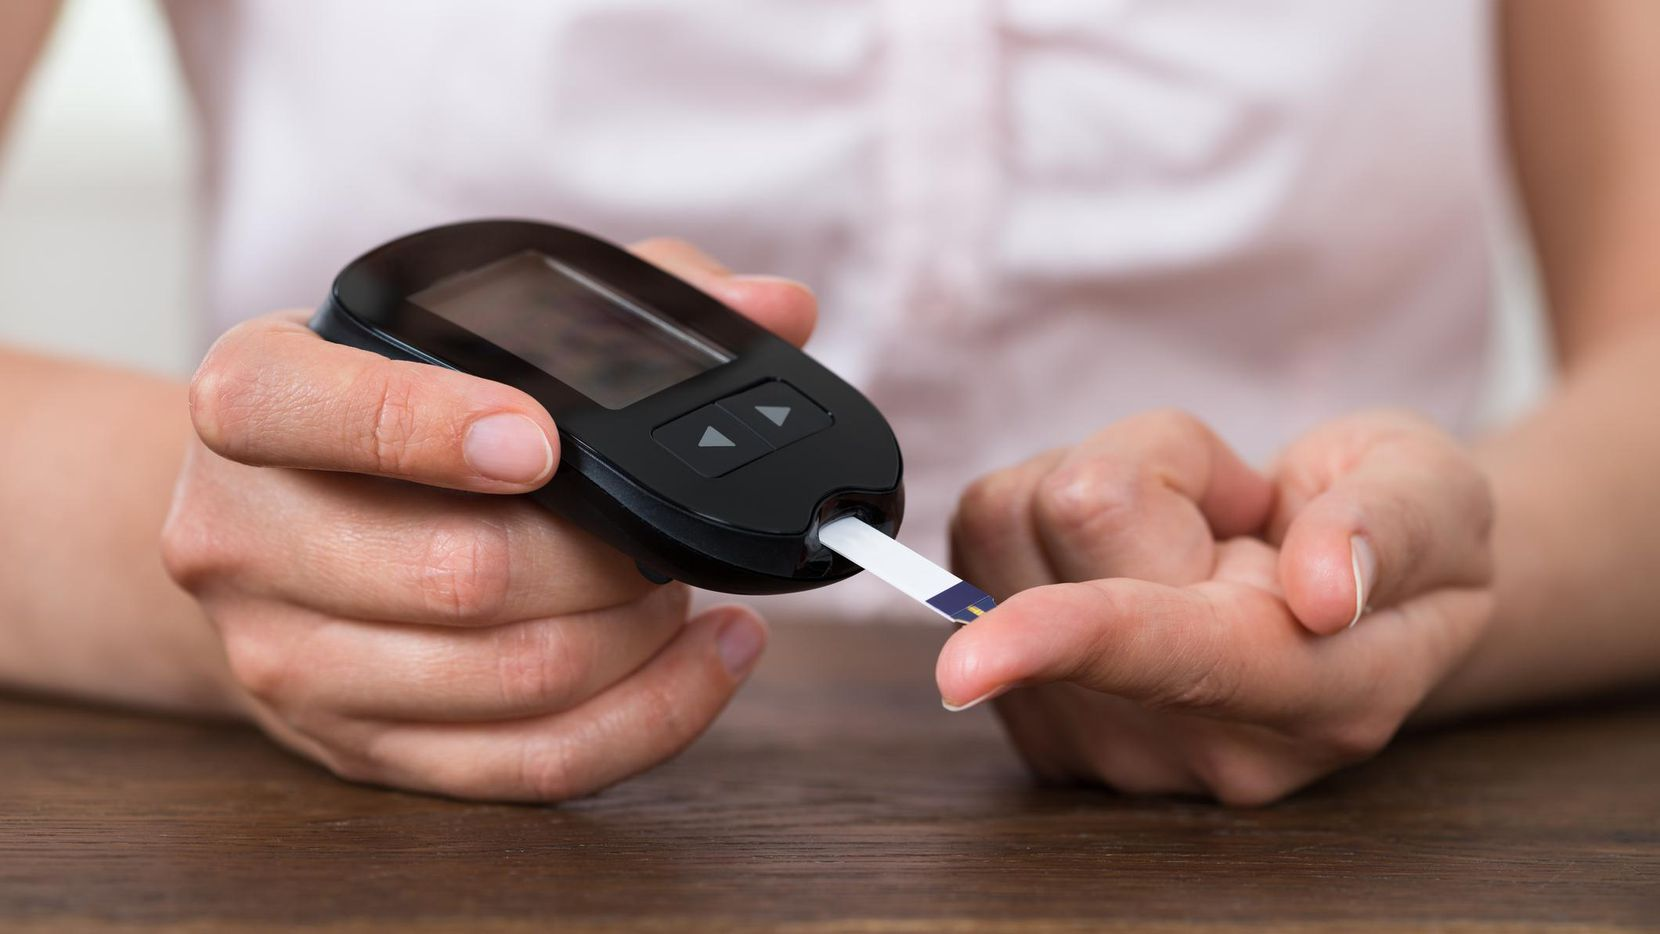 prueba de diabetes eqimebi